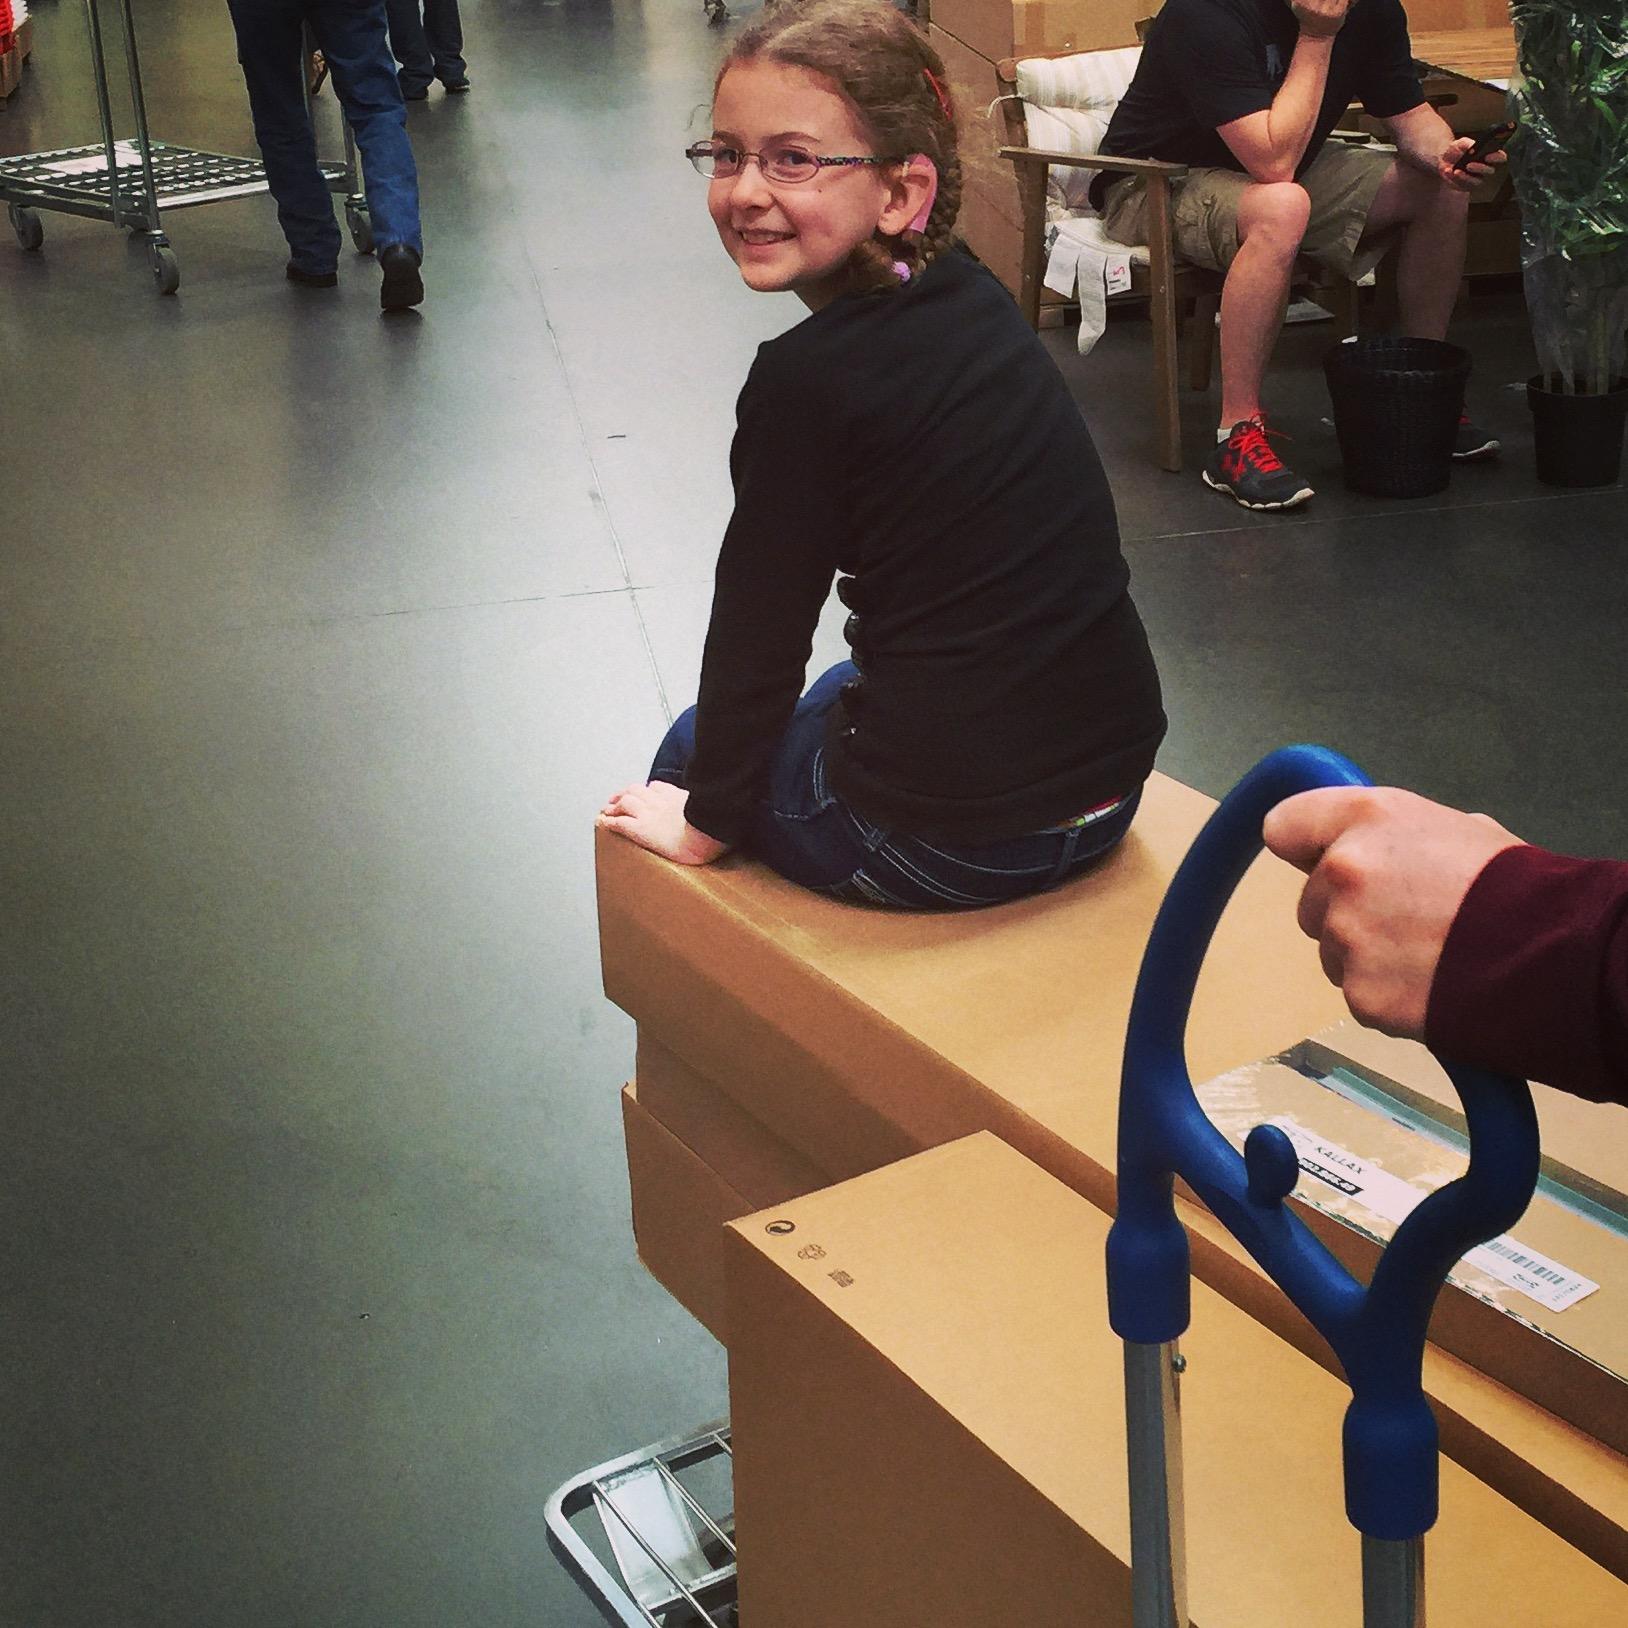 Eleanor enjoying a recent trip to IKEA